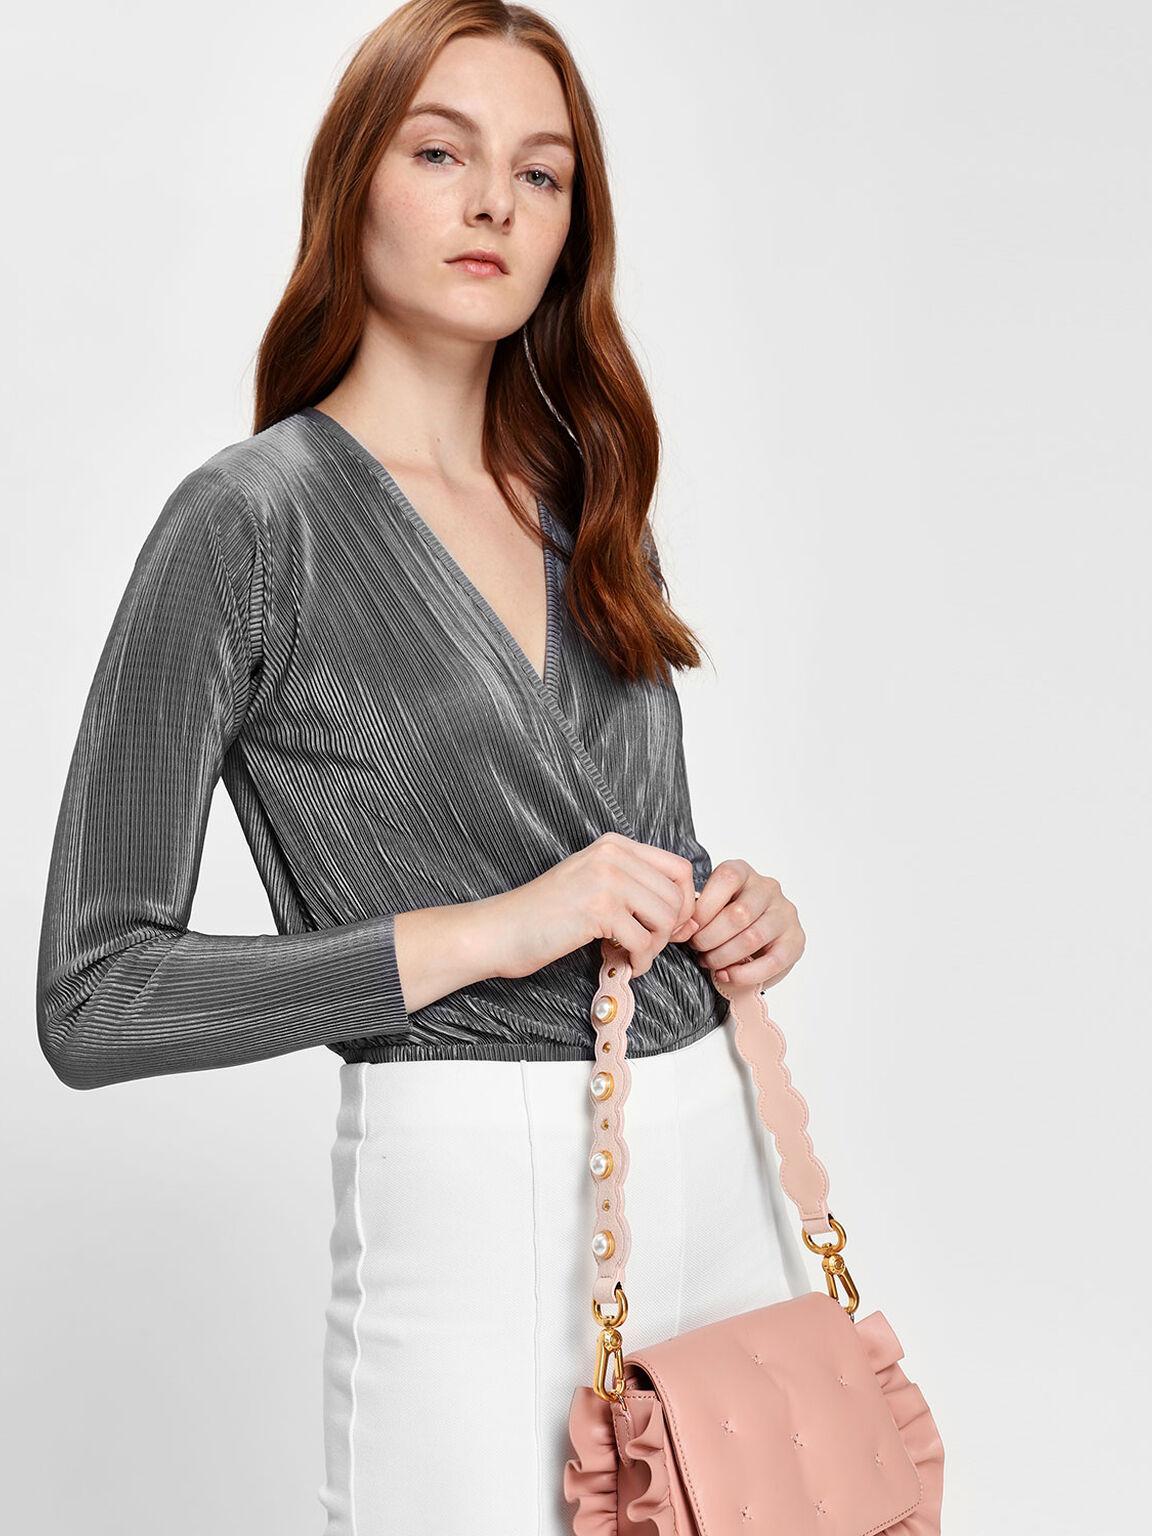 Pearl Embellishment Short Bag Strap, Pink, hi-res